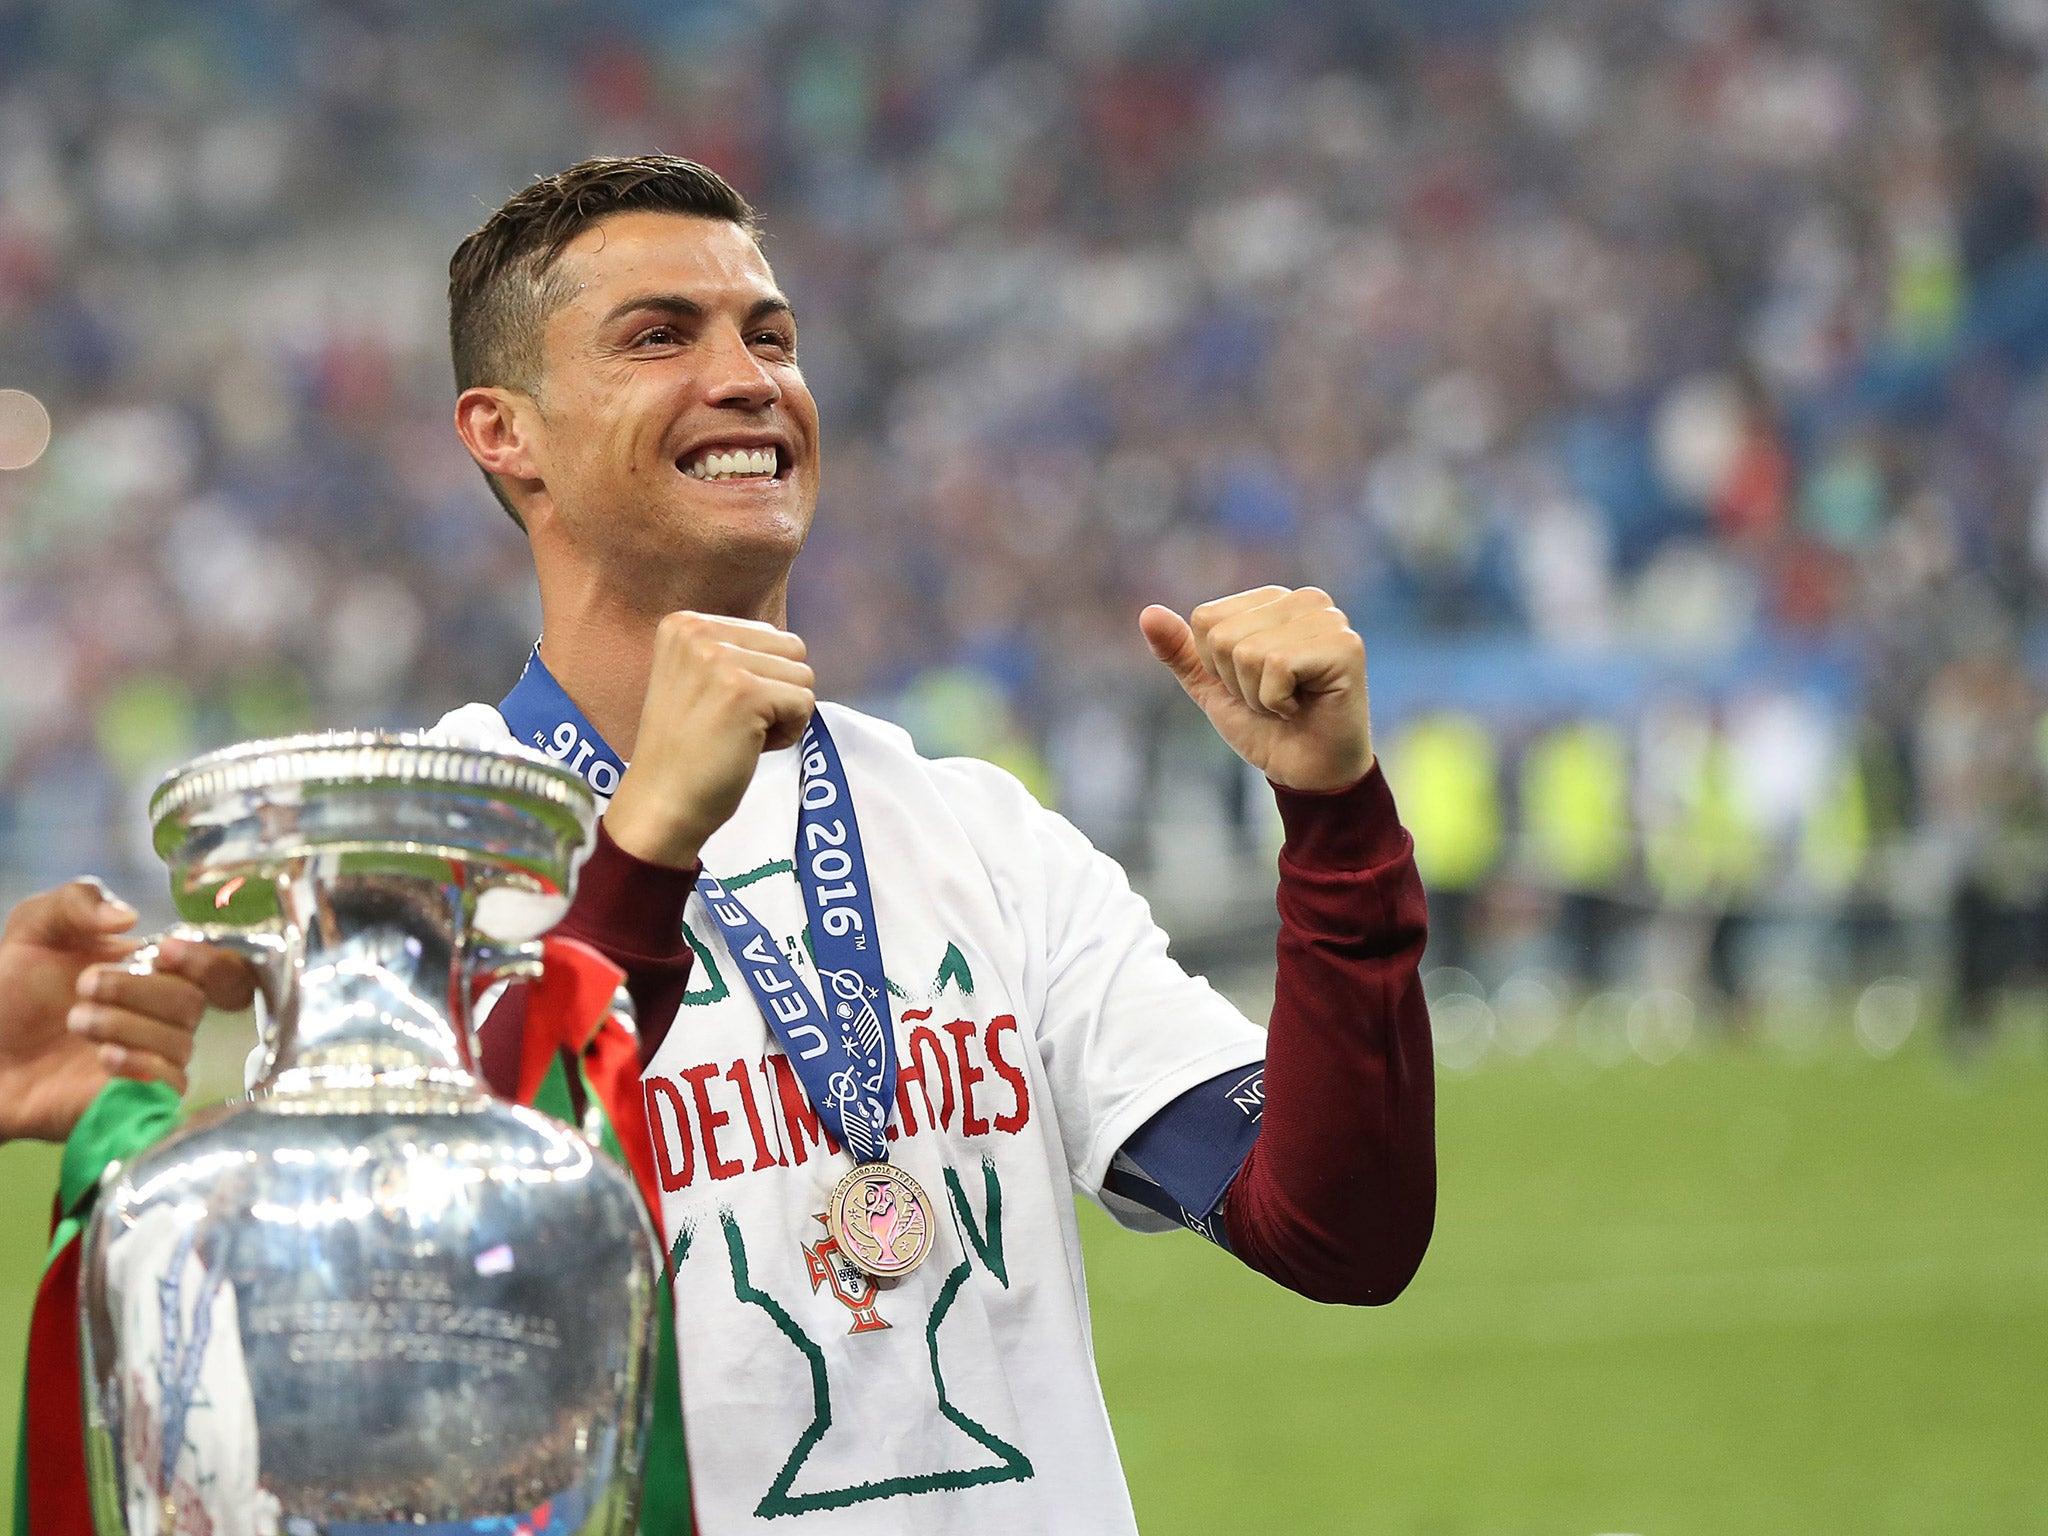 Cristiano Ronaldo Euro 2016 final win is for all of Portugal